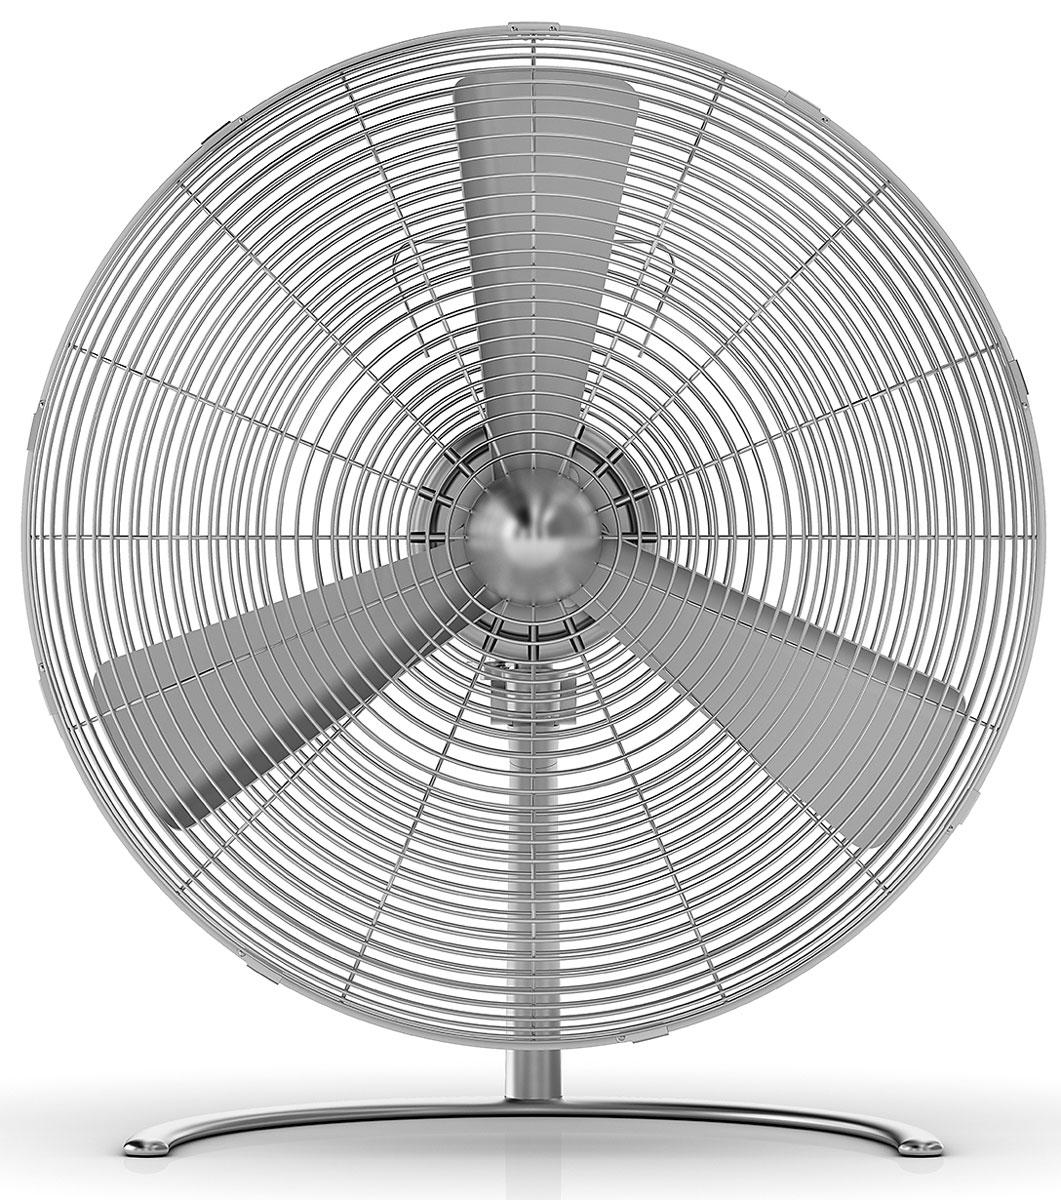 Stadler Form Charly Fan Table New, Silver вентилятор настольный 0802322002867